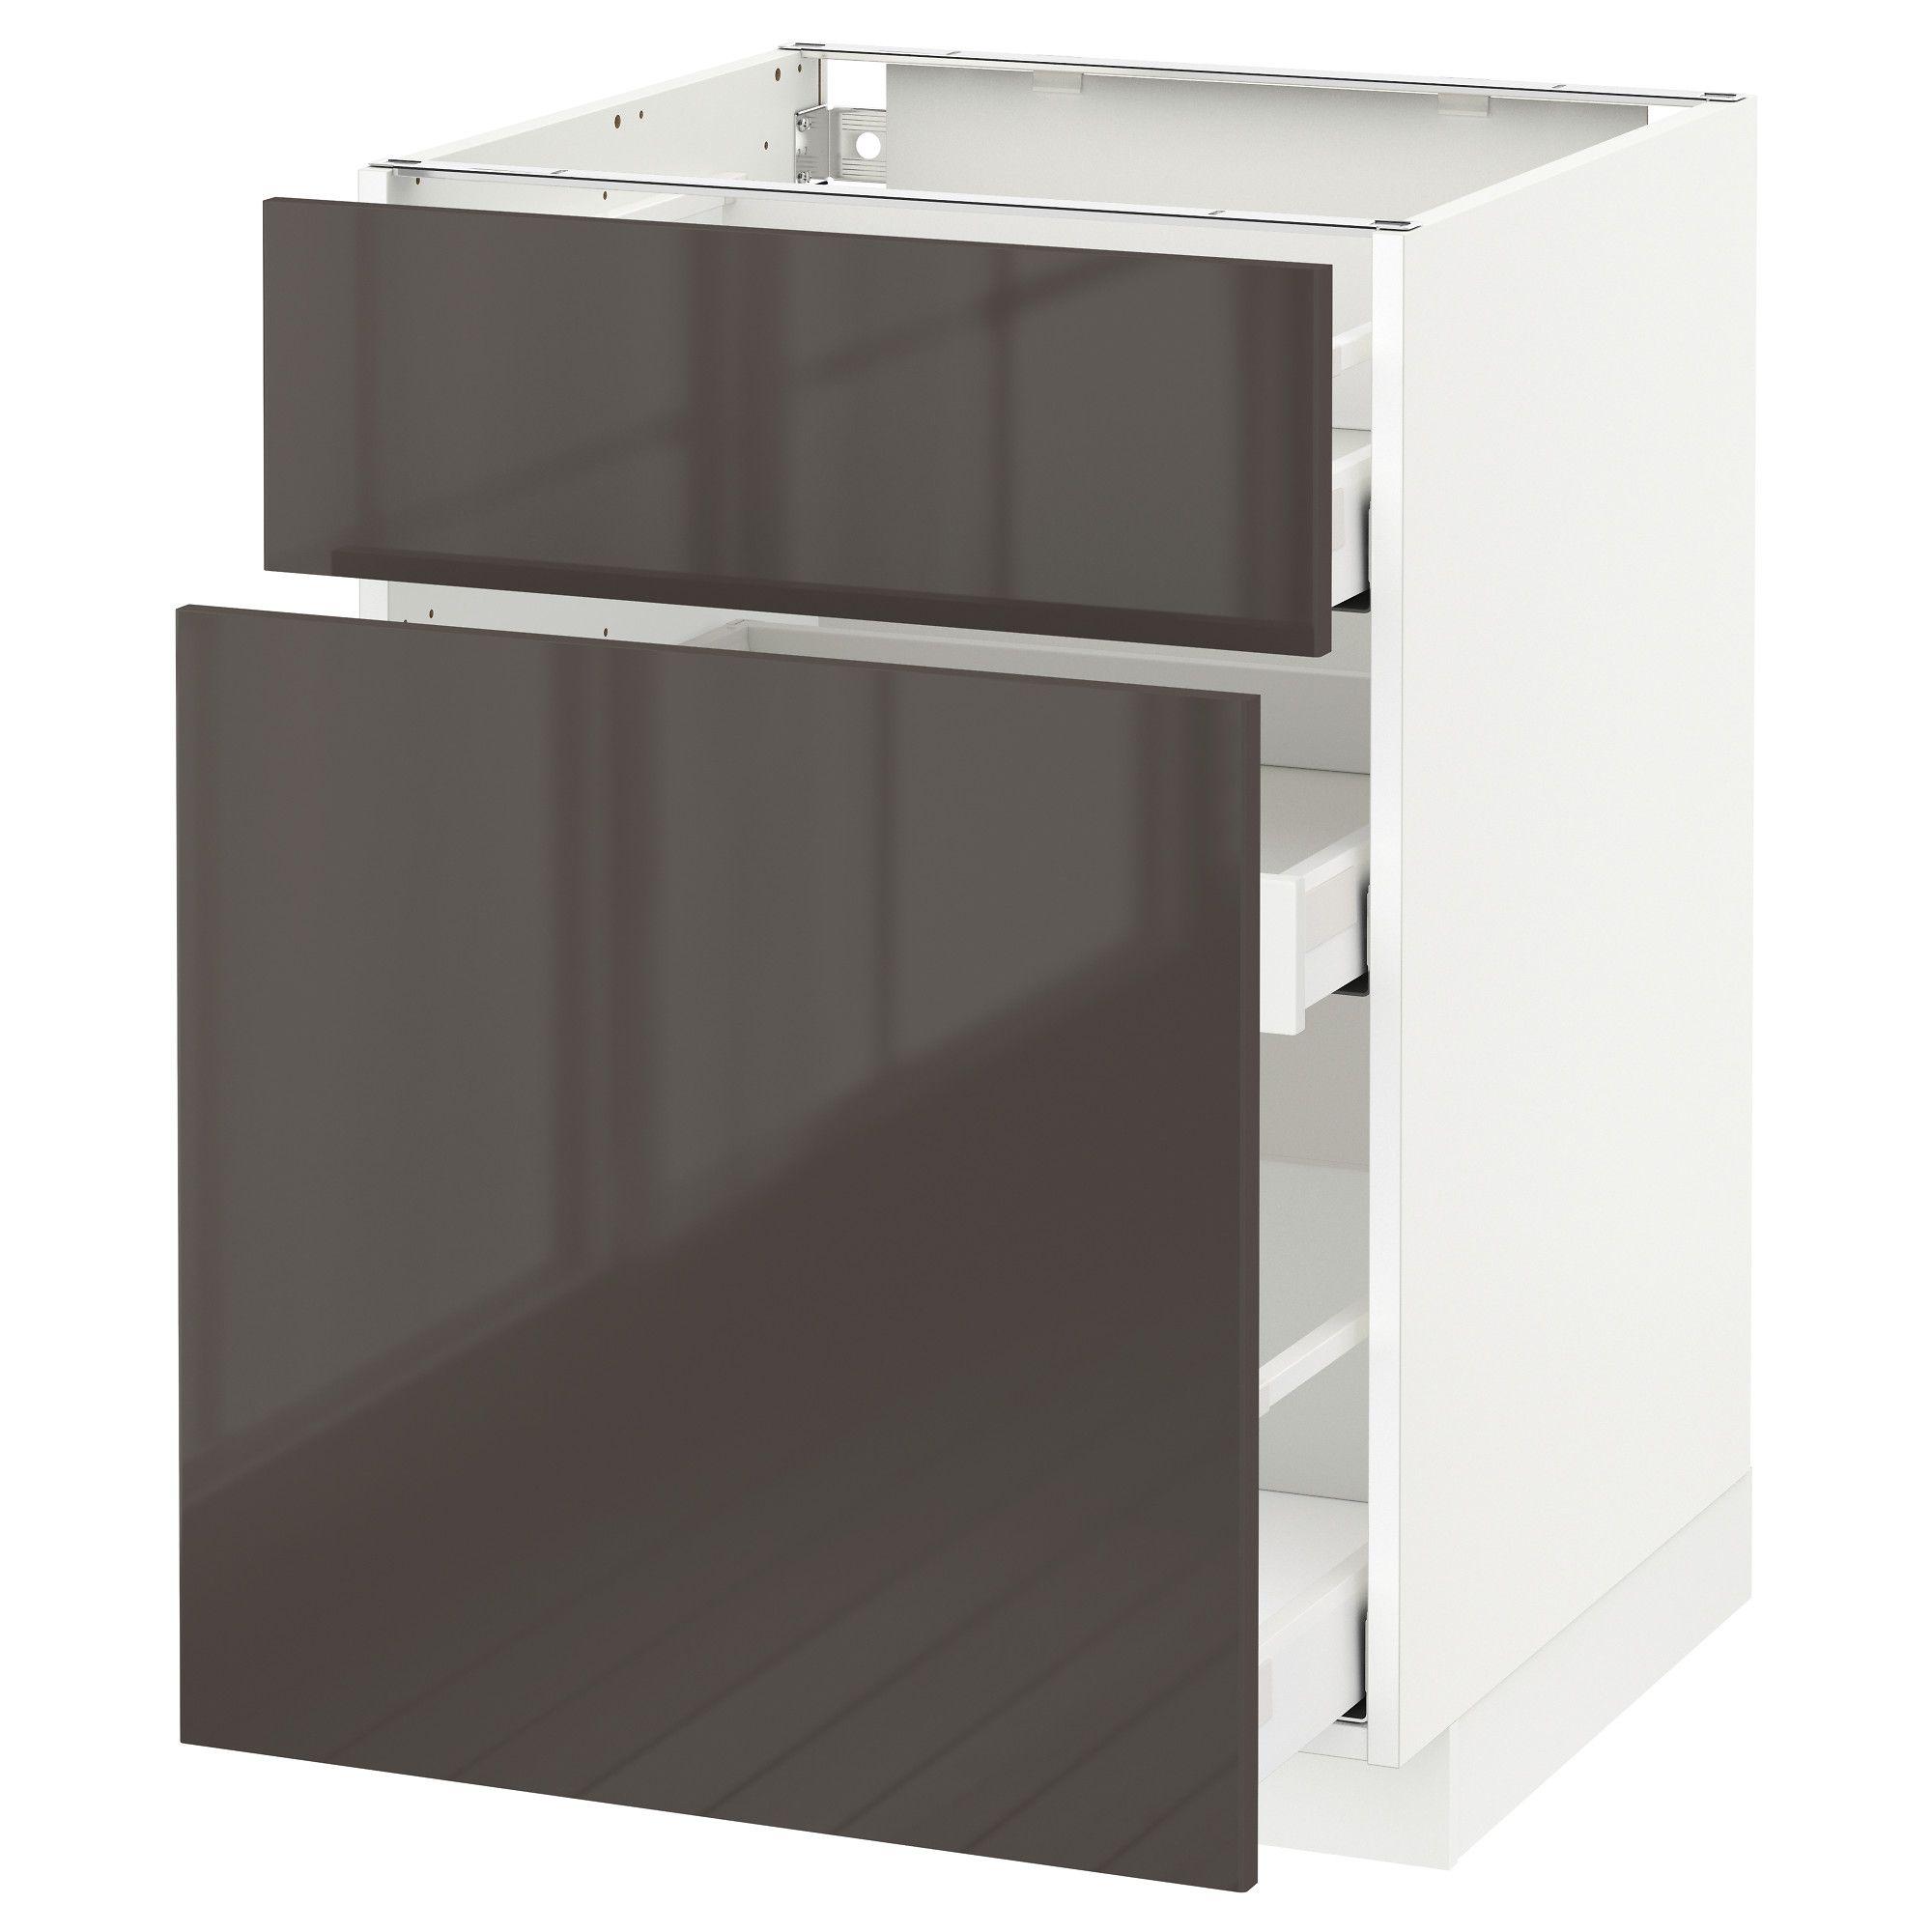 Metod Maximera Element Bas Rangement Coul Tiroir Blanc 60x60 Cm Ringhult Brillant Gris Ikea Cuisine 3m Ikea